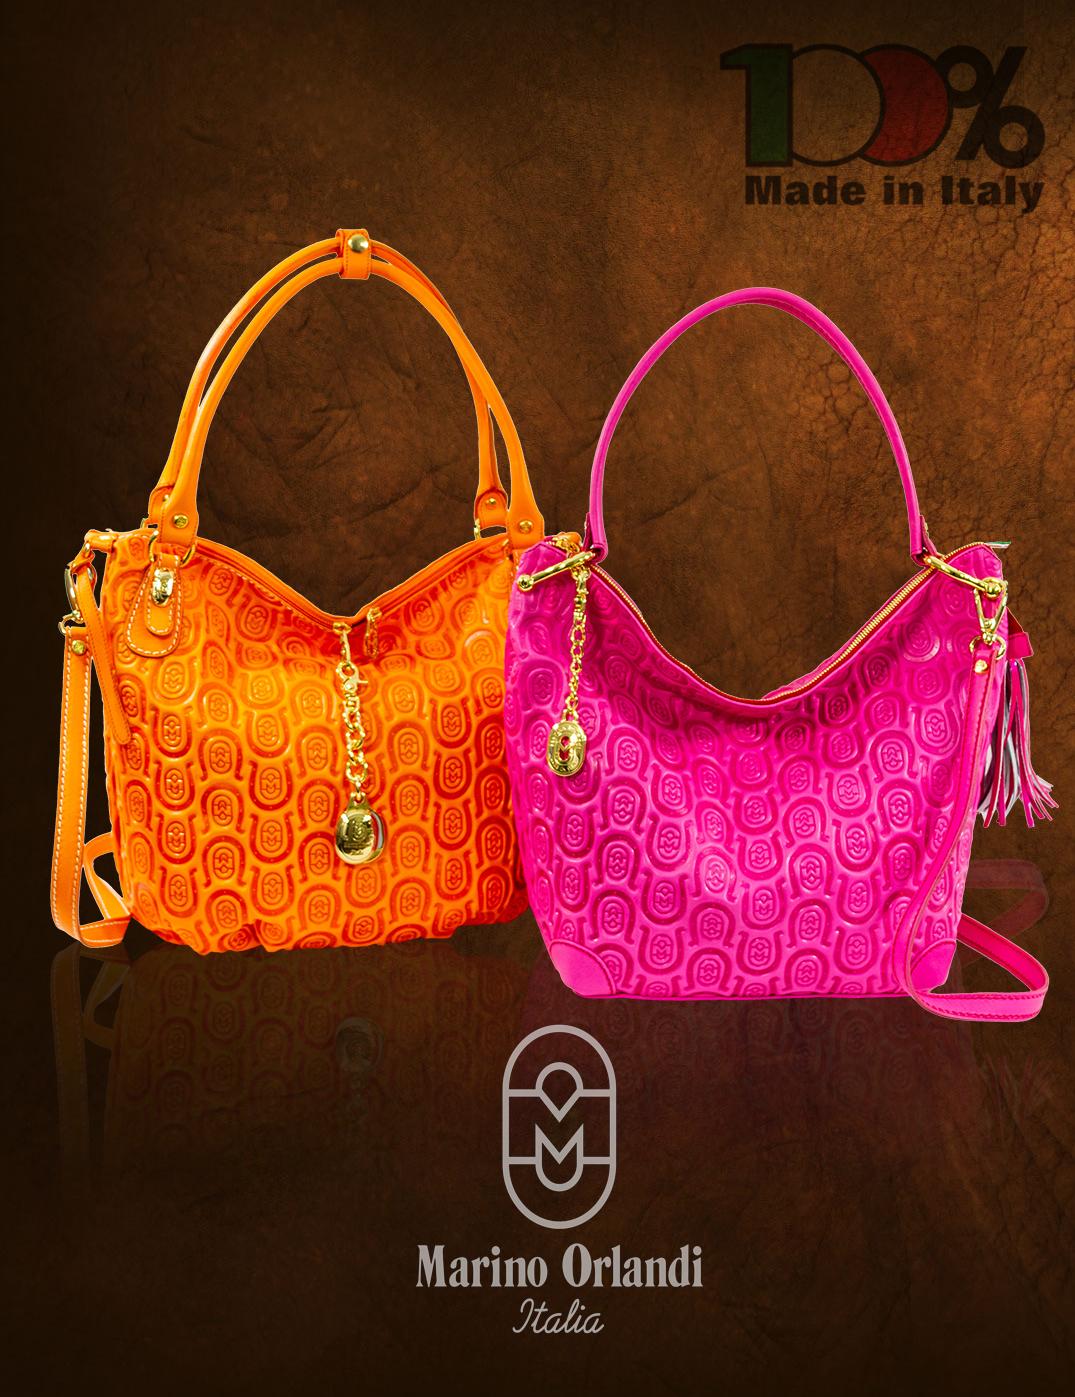 Marino_Orlandi_Orange_Equestiran_Monogram_Leather_Large_Crossbody_Bag_01MO4590MLOR_01.jpg